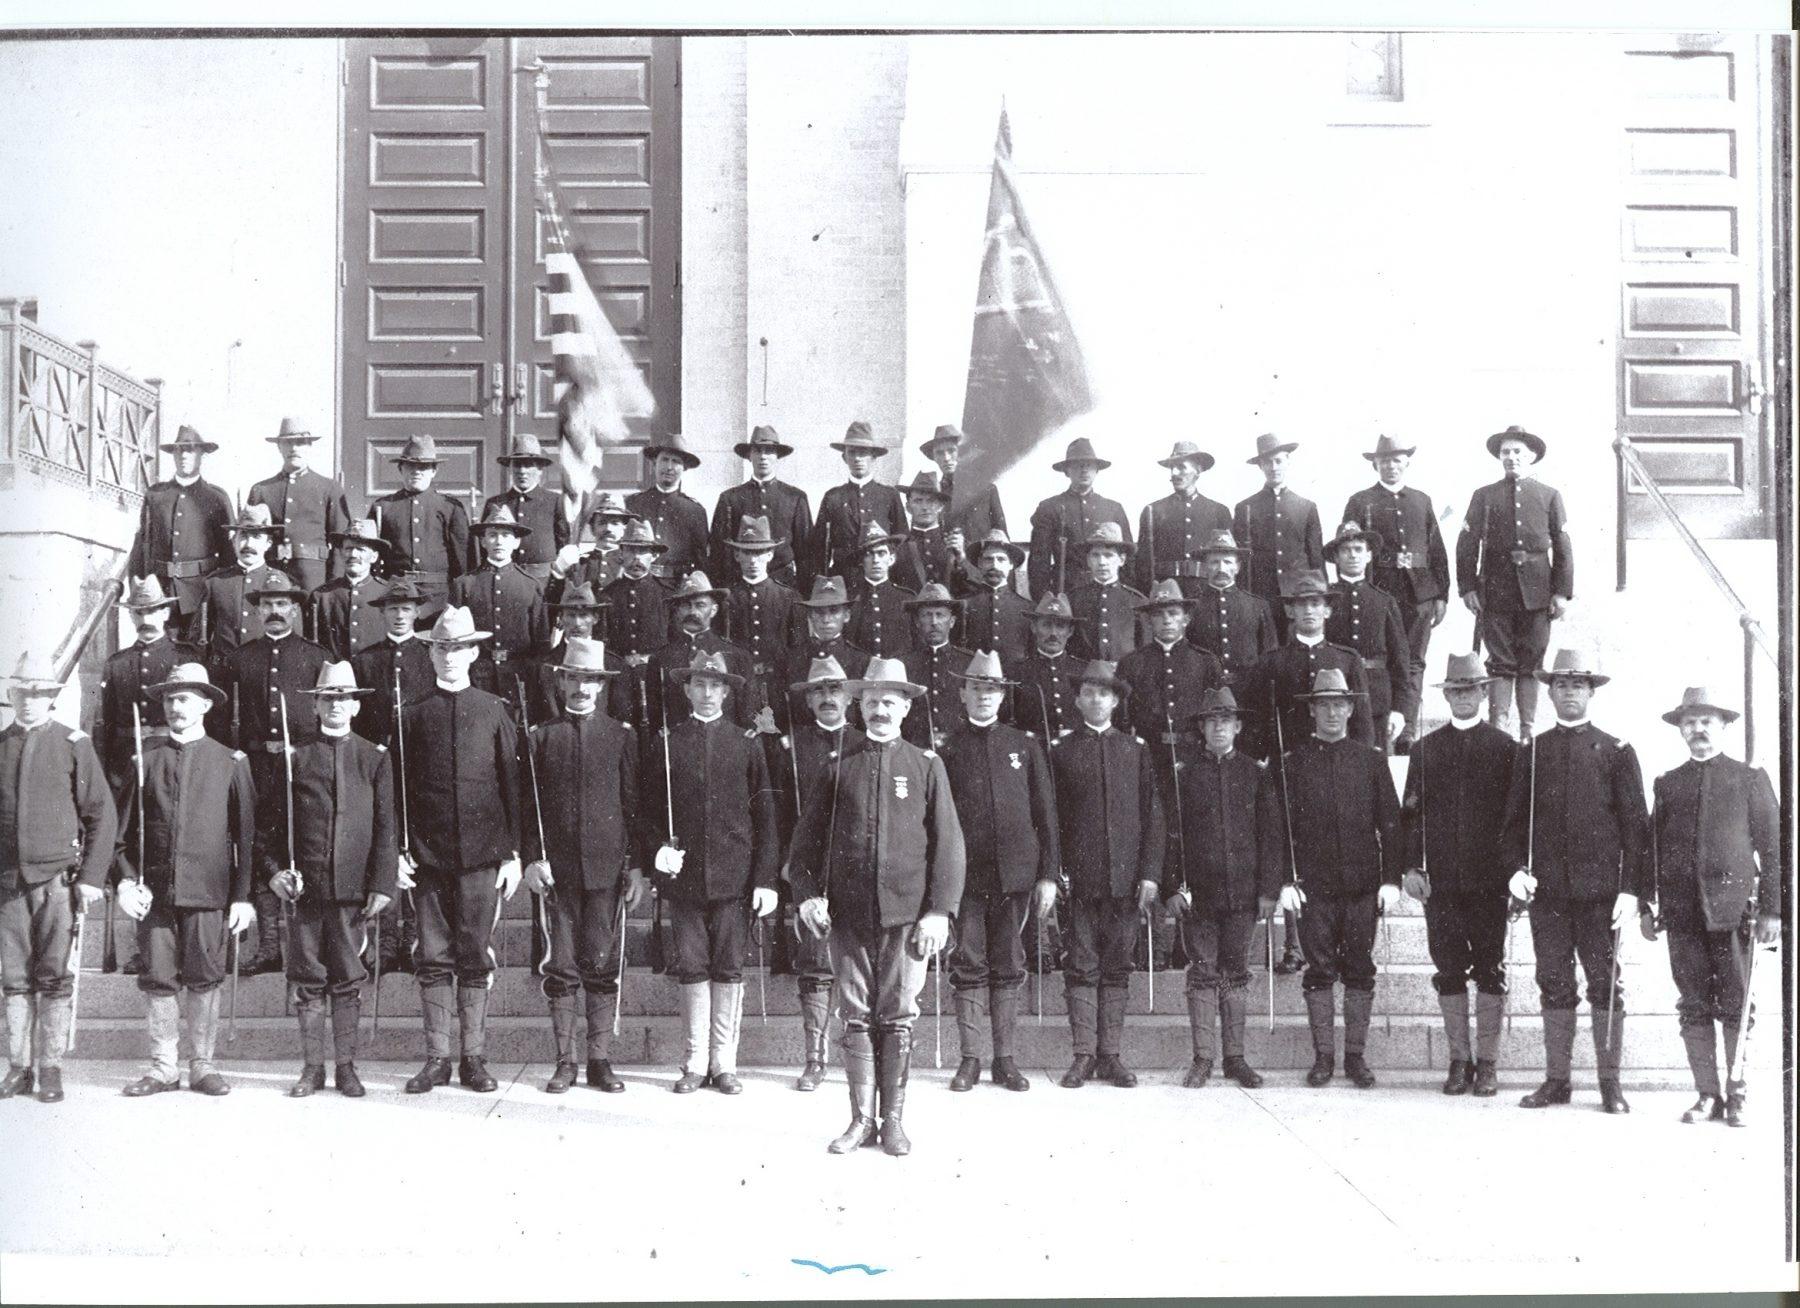 1913 photo of the Hibernian Rifles